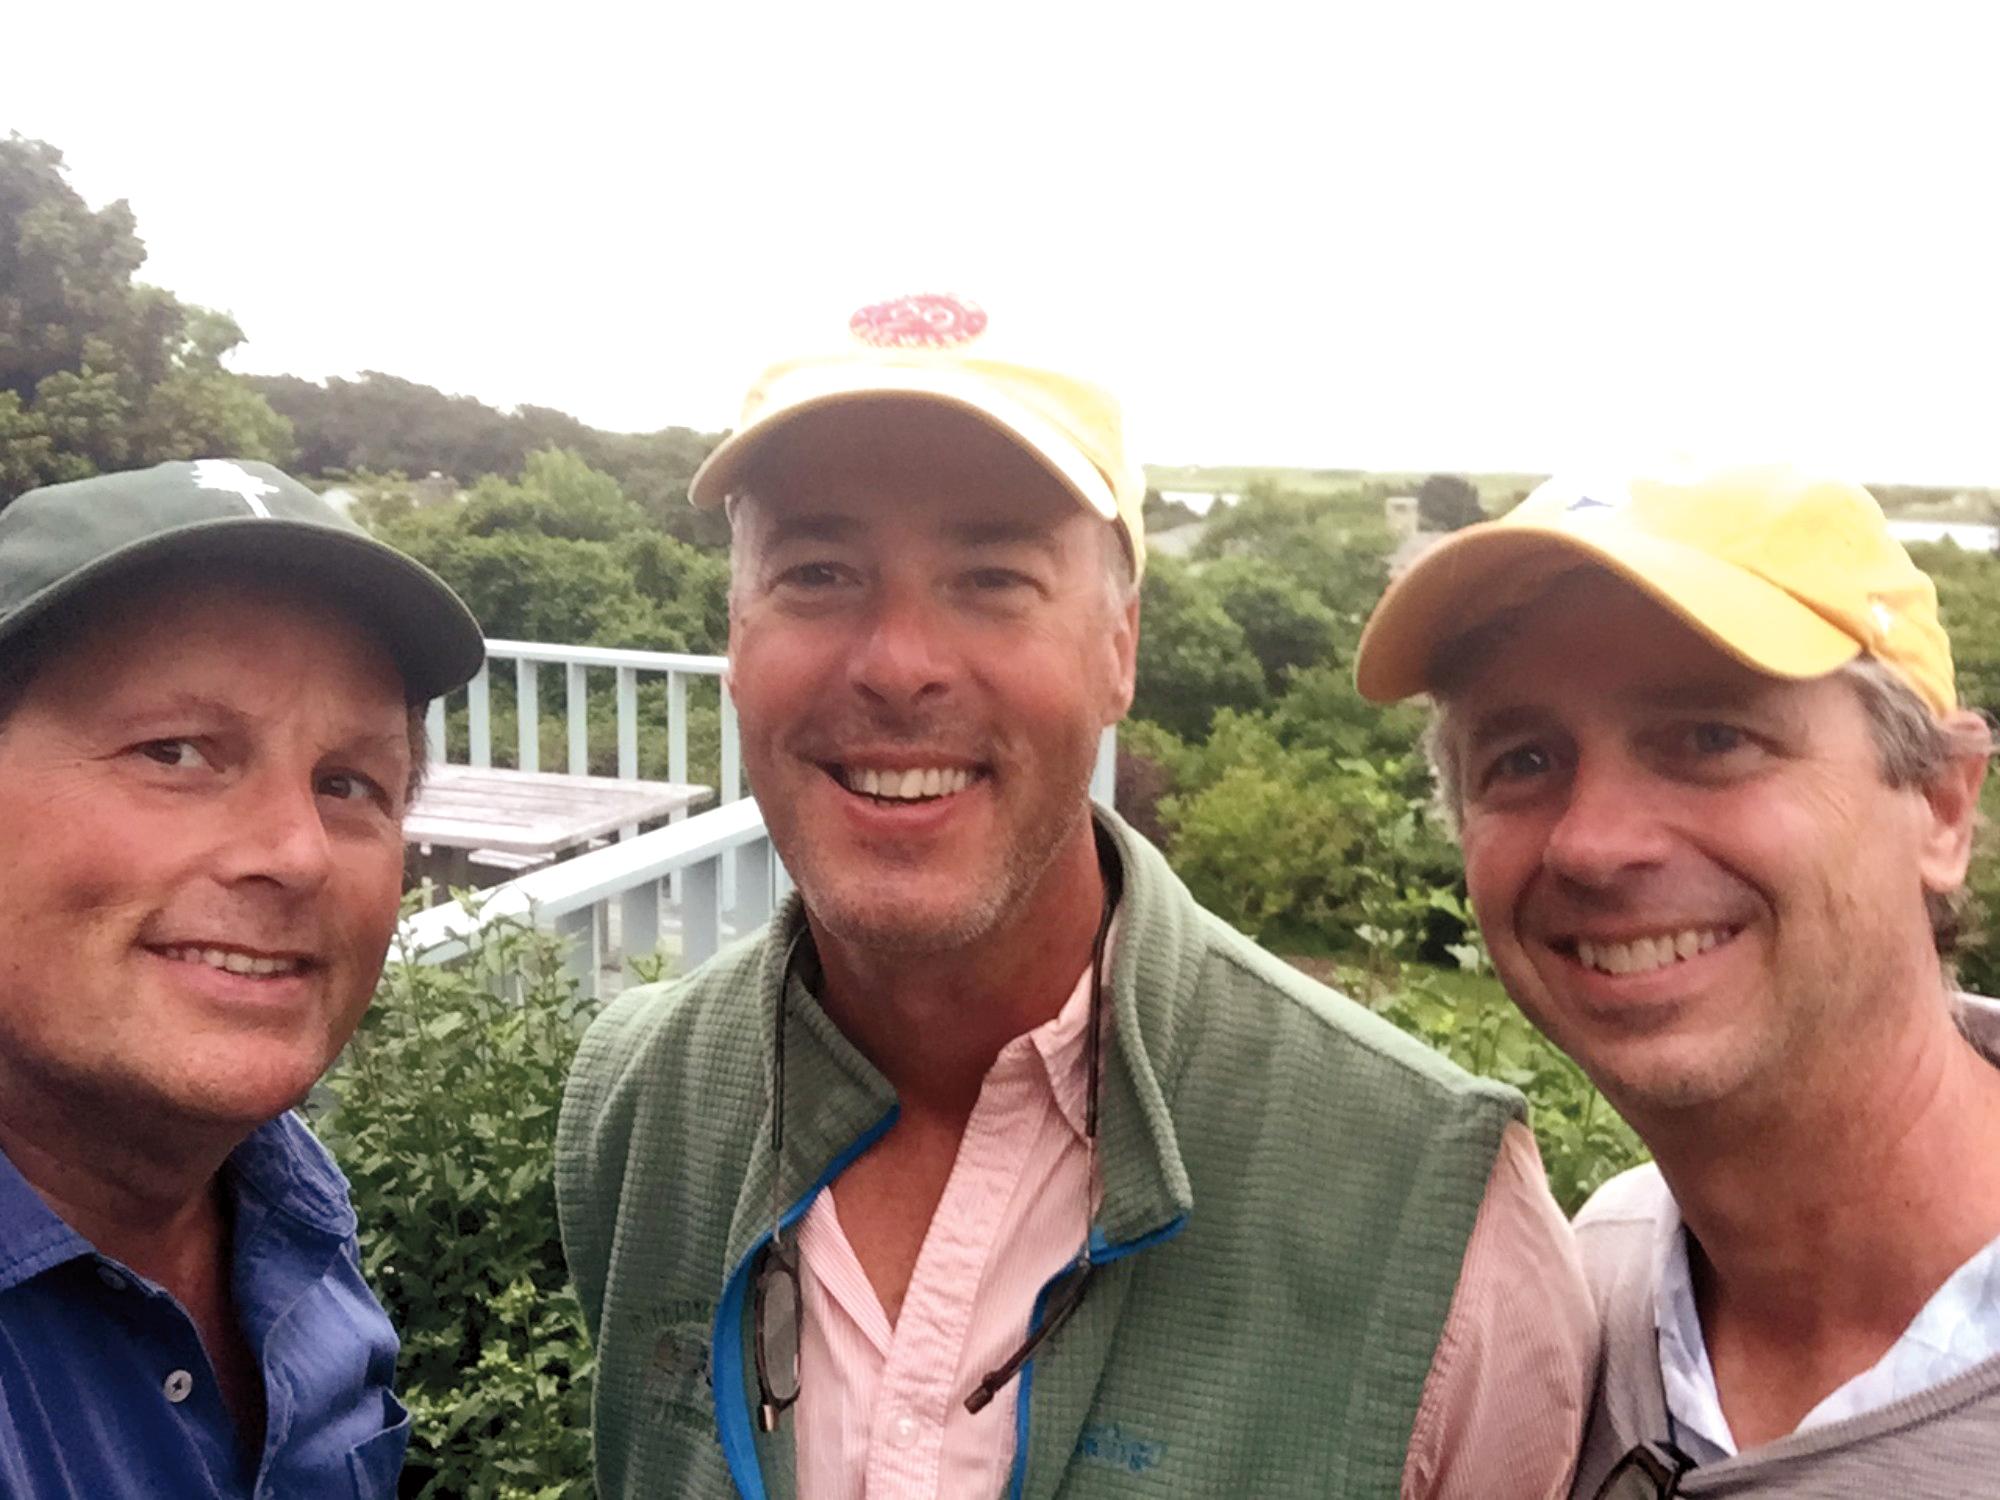 Pittsburgh boys (l. to r.) Bill Van Ingen '80, Tim Sullivan '80, and Rich Walsh '80, on Martha's Vineyard.